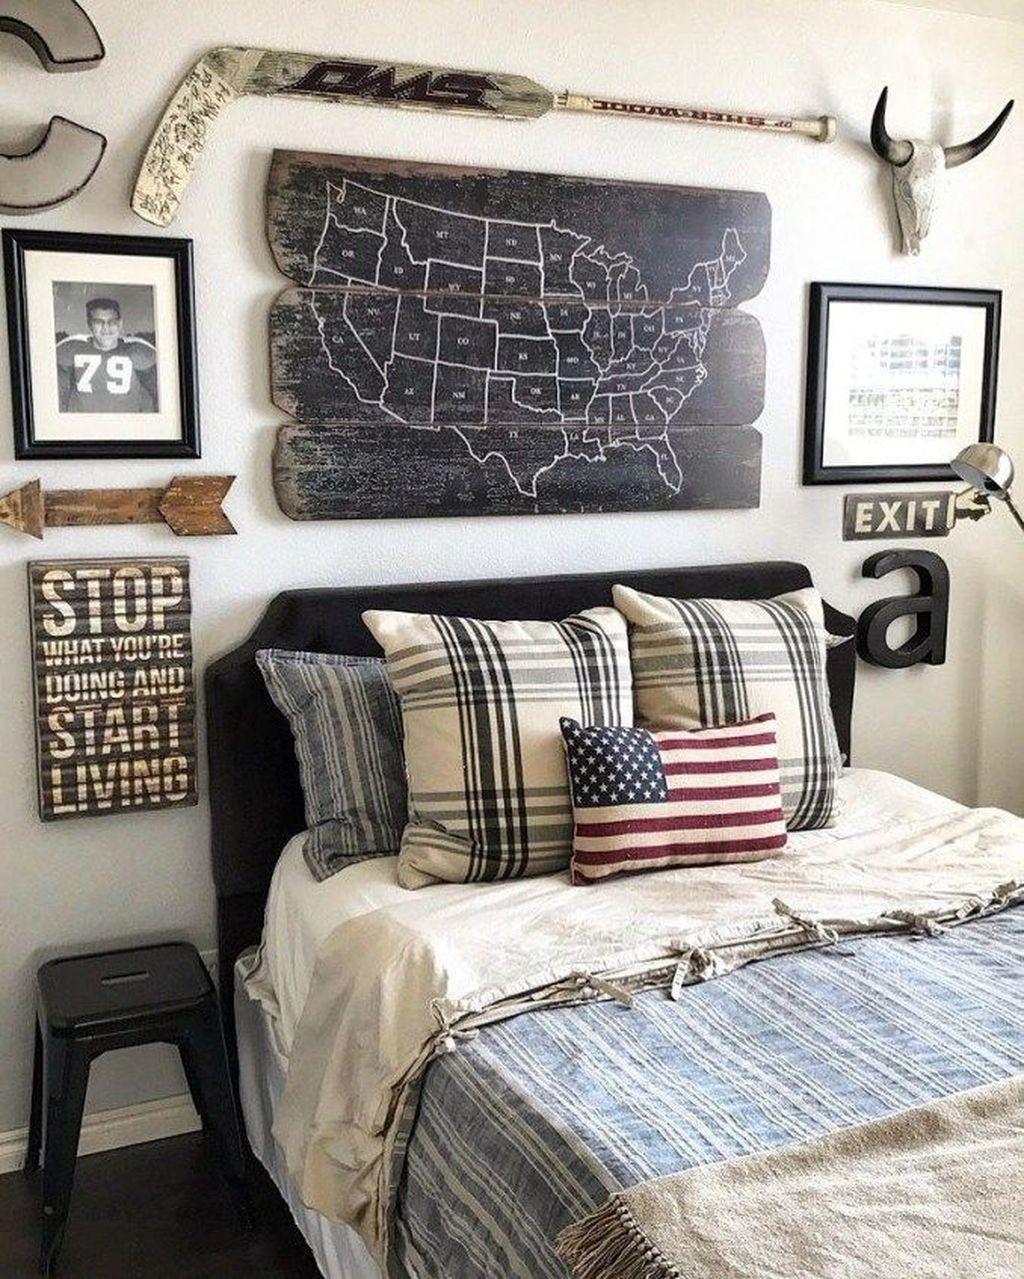 20 Cool And Fun Teens Bedroom Design Ideas Trenduhome Boys Bedroom Gallery Wall Rustic Boys Bedrooms Boys Room Decor Cool teen room ideas